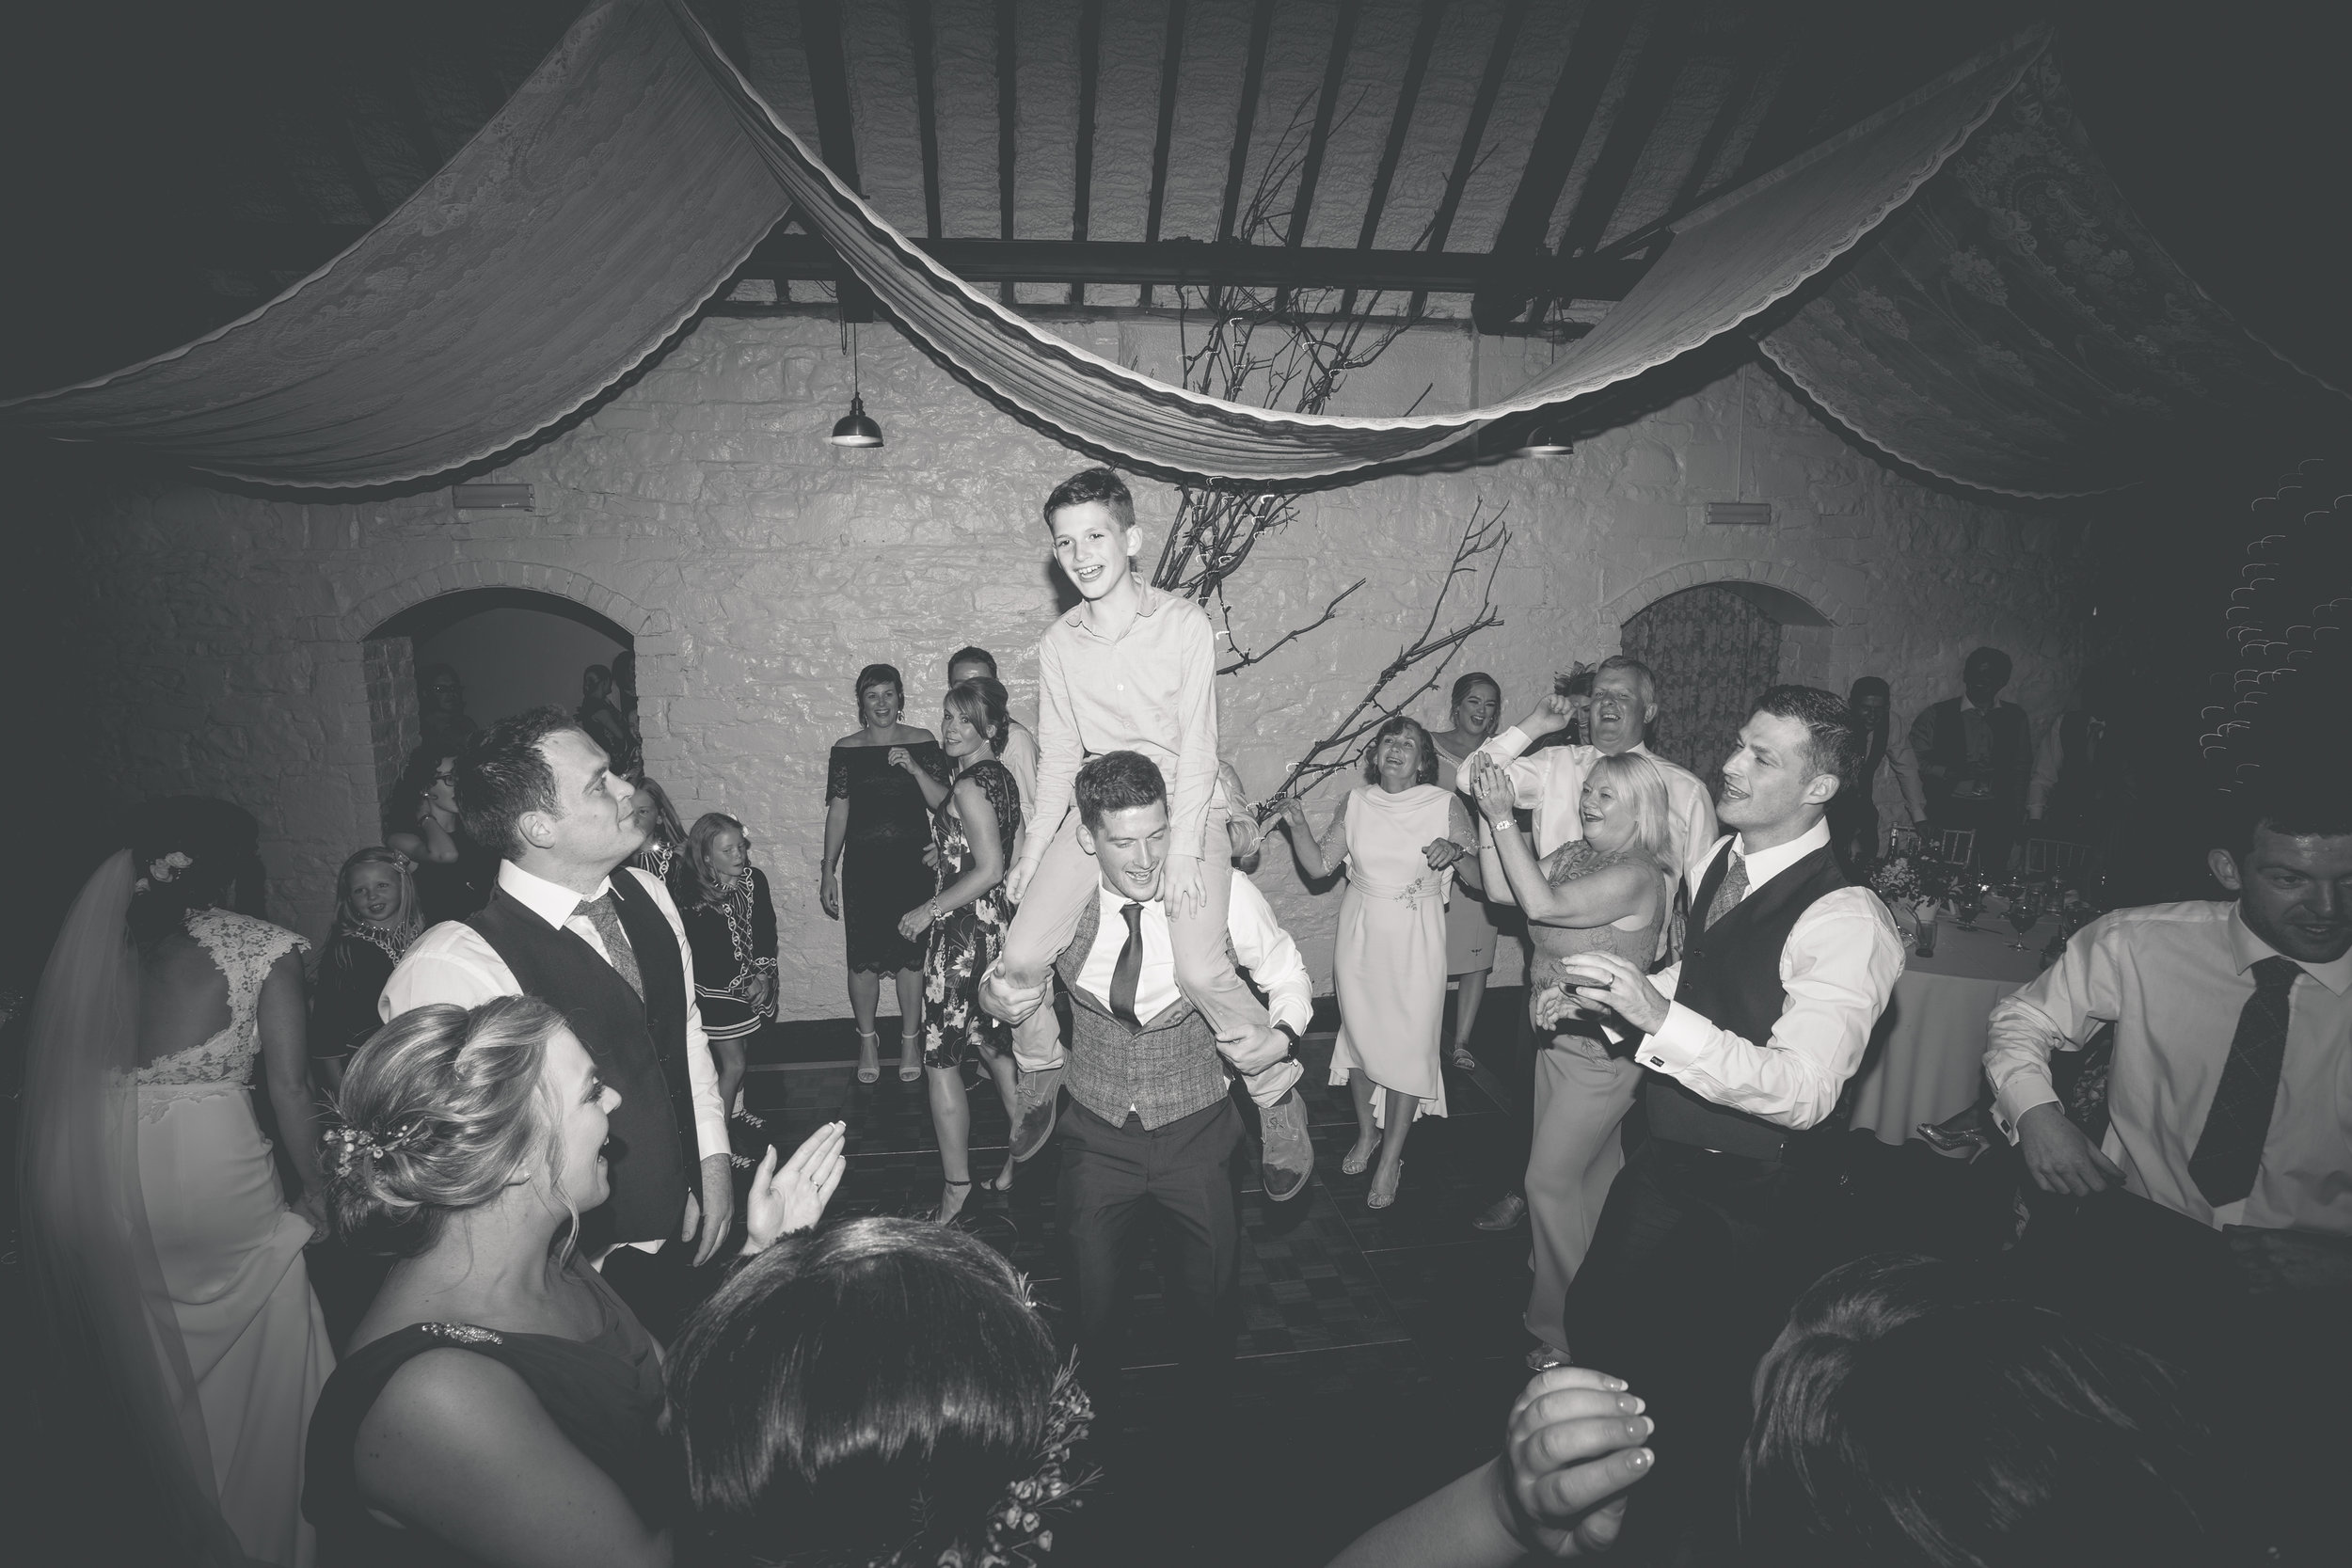 Brian McEwan Wedding Photography | Carol-Annee & Sean | The Dancing-71.jpg